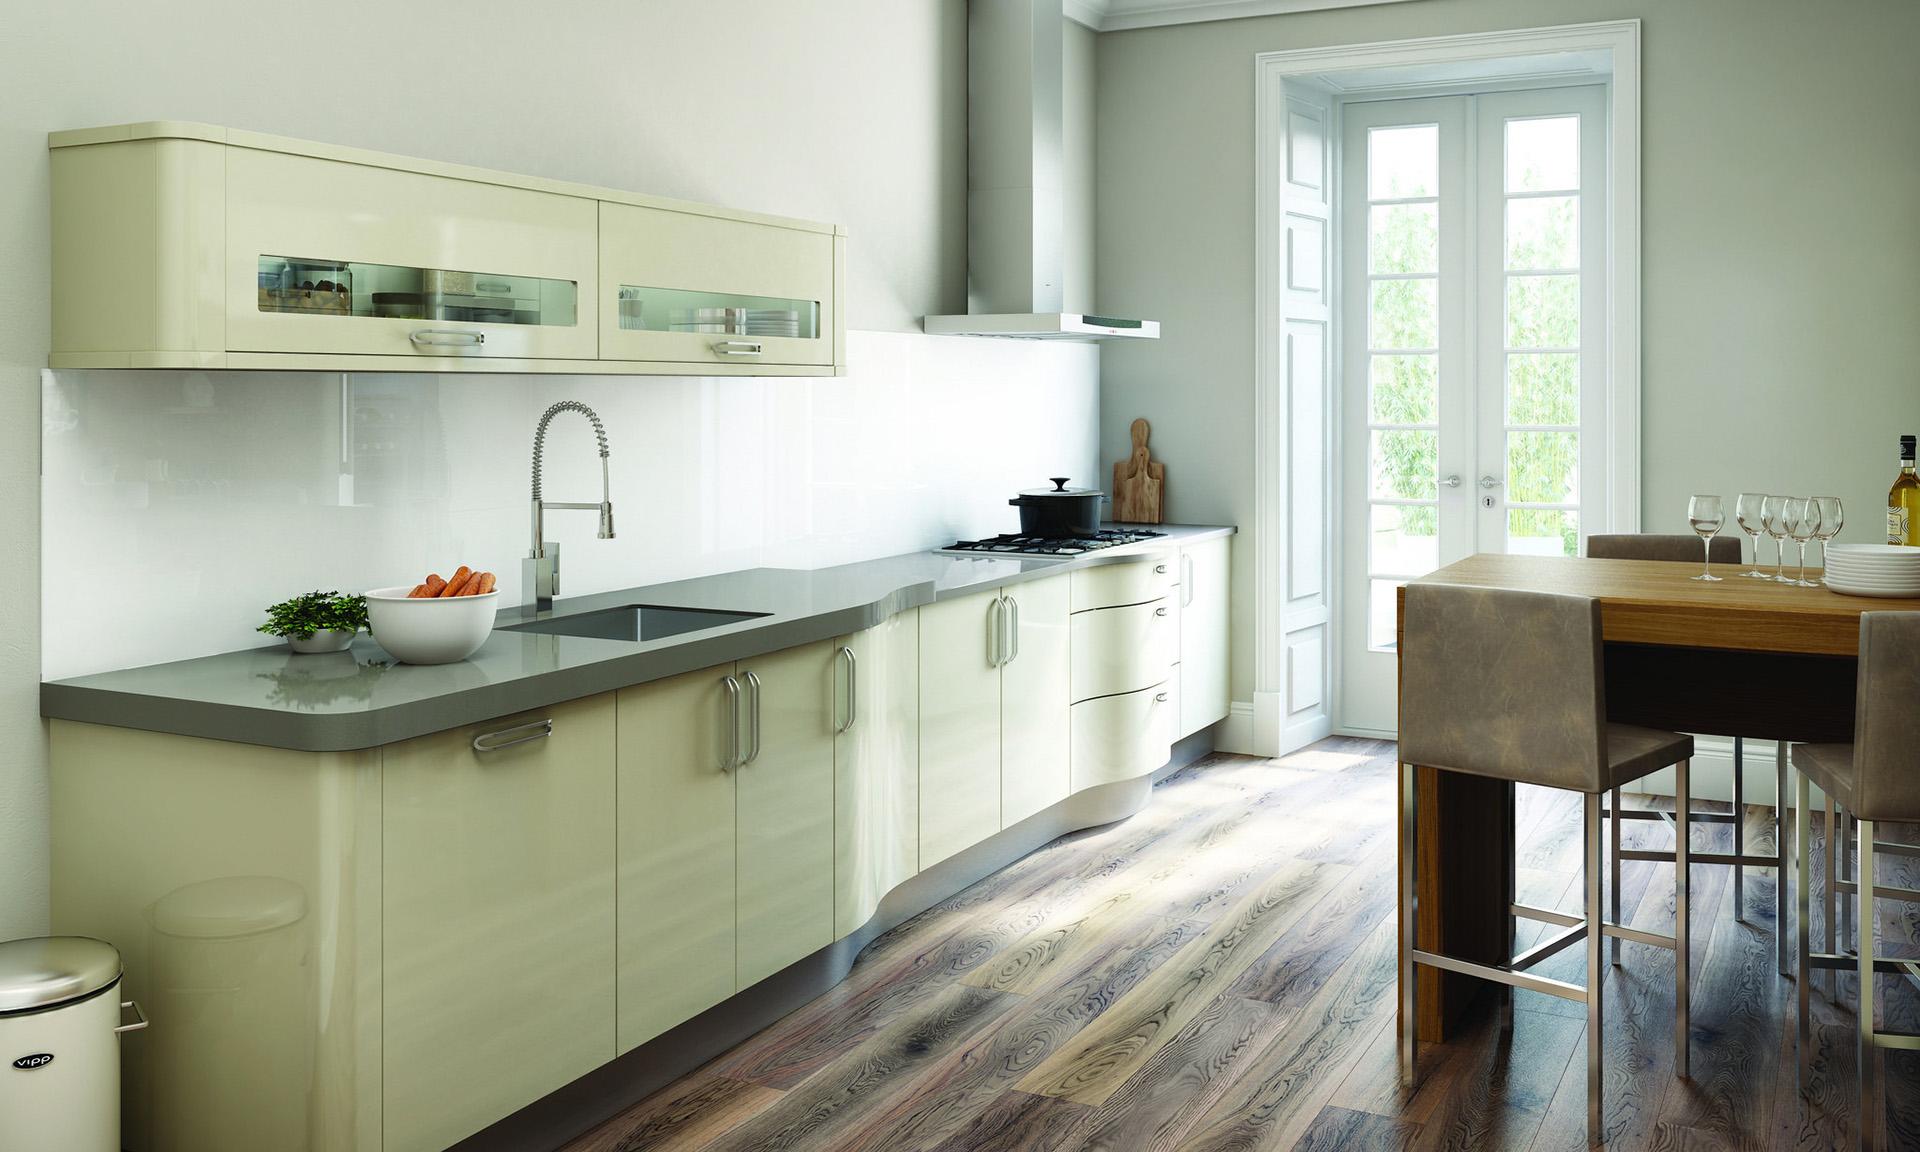 Fullsize Of Pictures Of Designer Kitchens